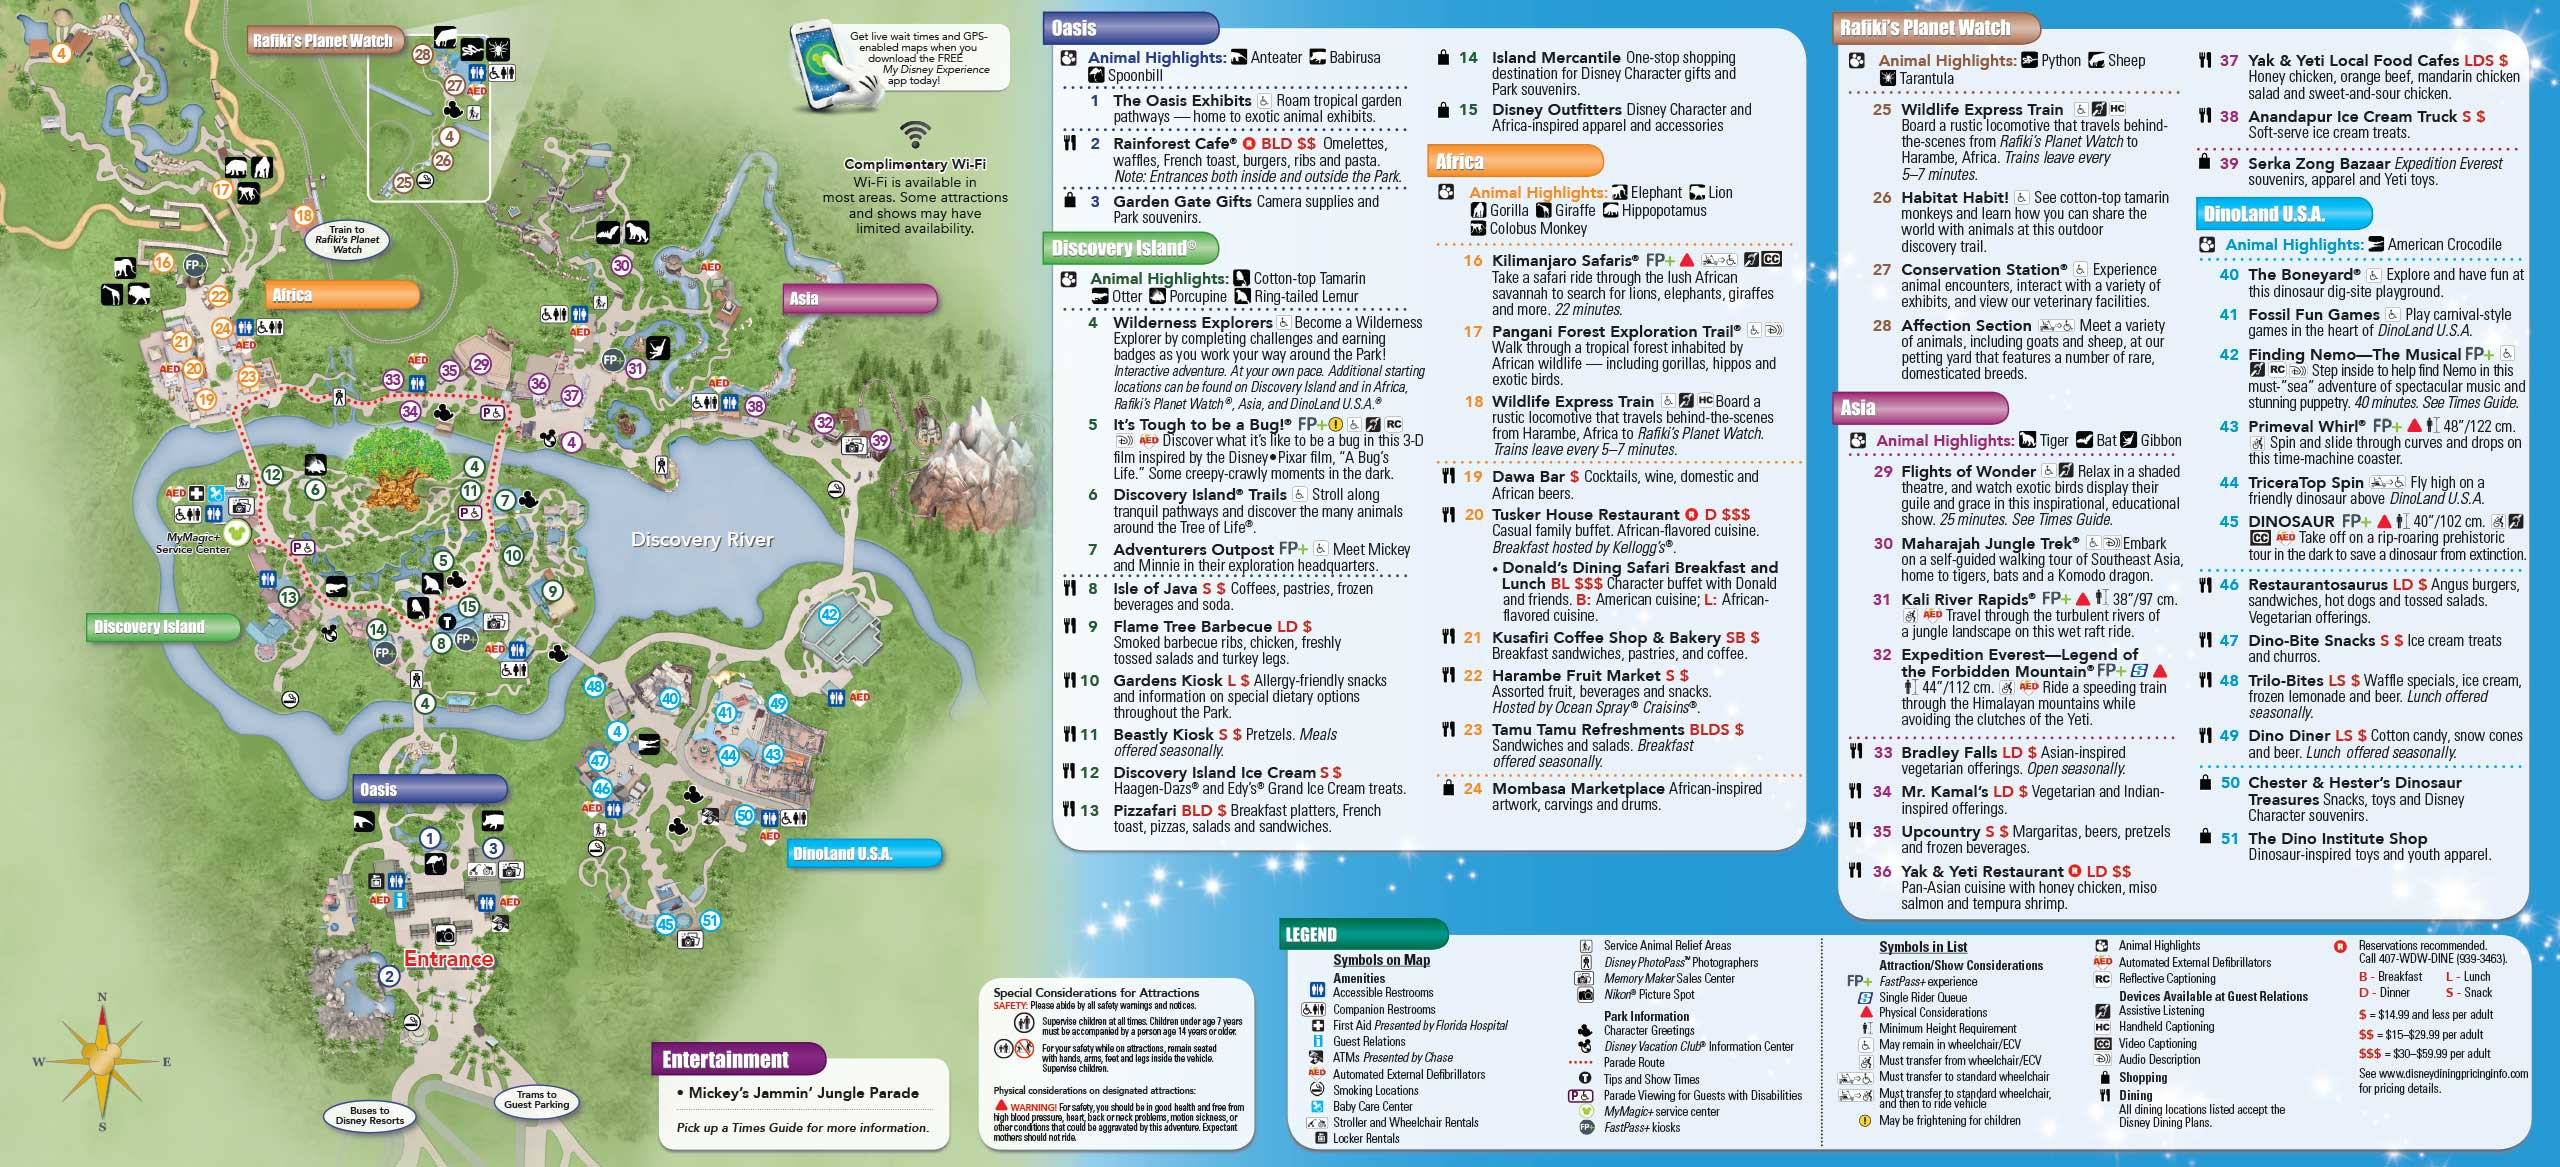 Disneyland California Map Pdf Printable Asia Map Outline Pdf Lovely - Printable Disney World Maps